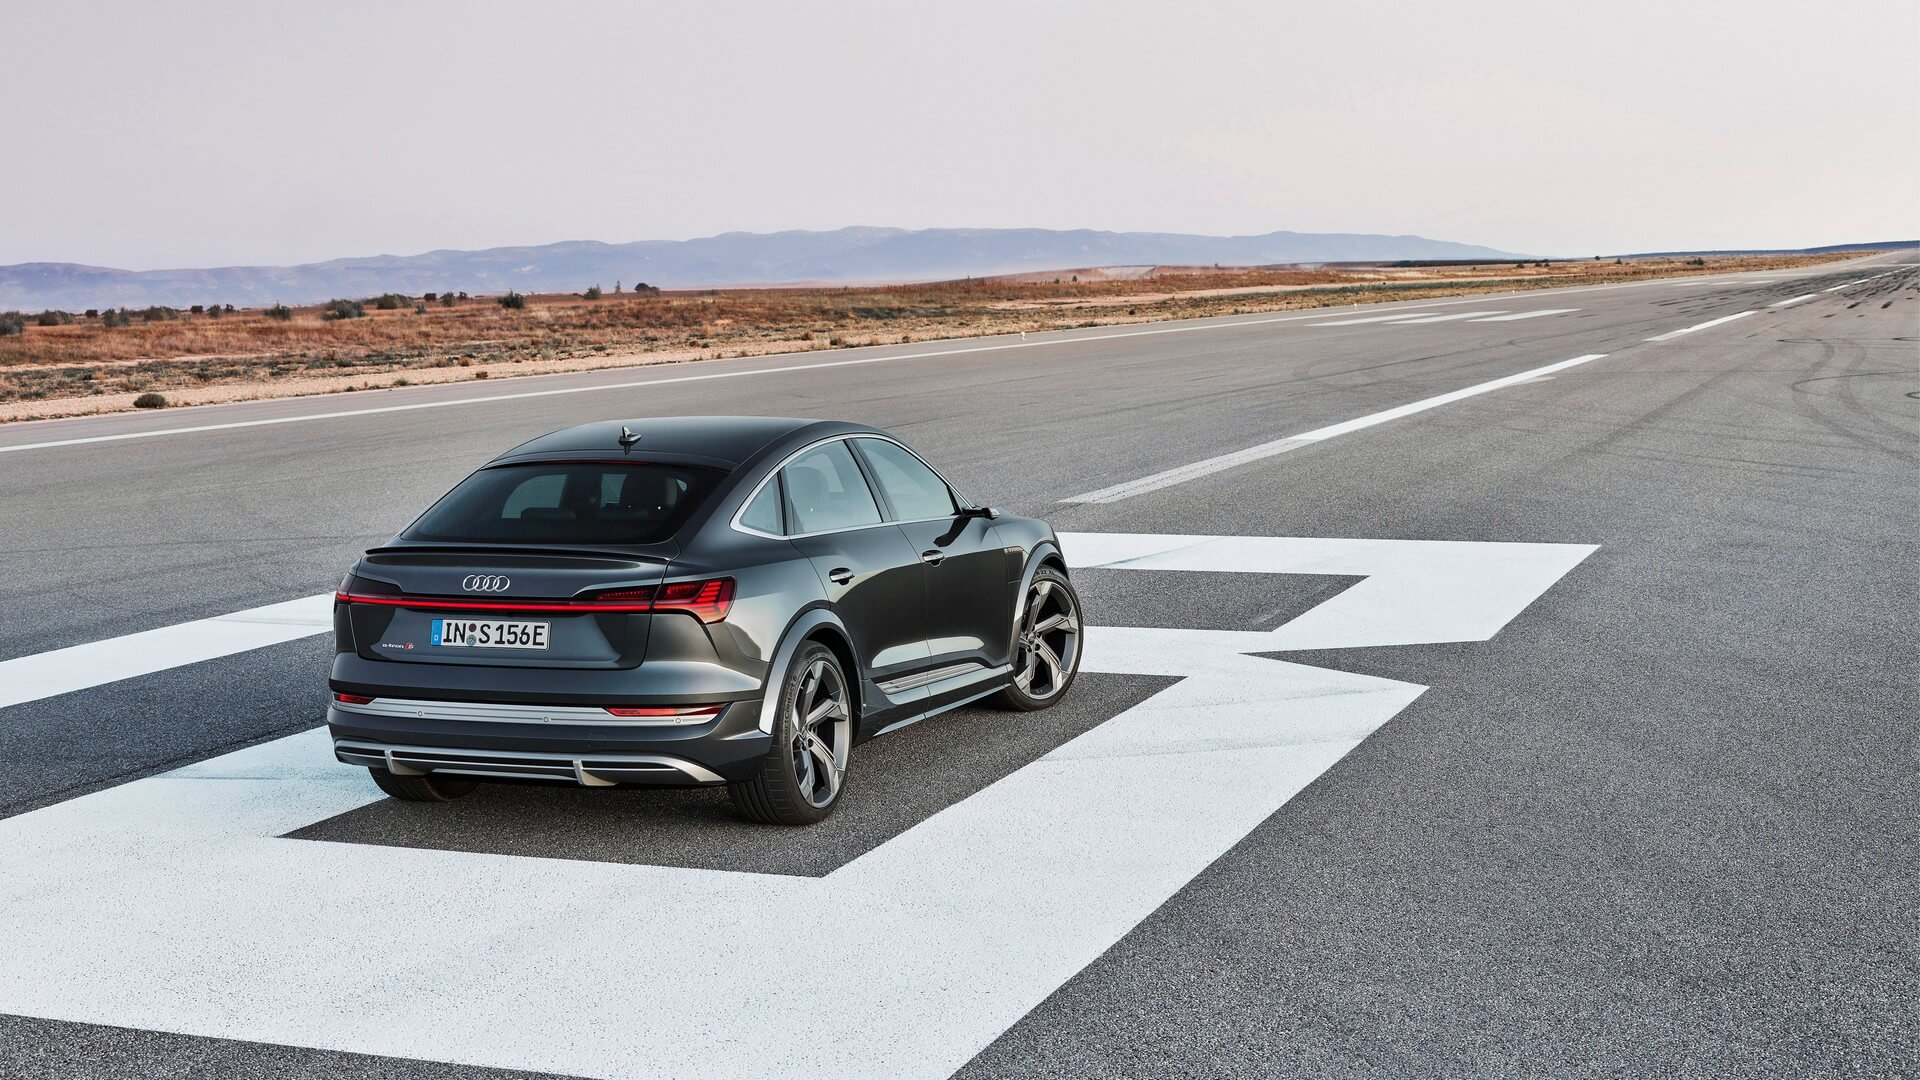 Audi-E-Tron-S-and-E-Tron-S-Sportback-2020-82